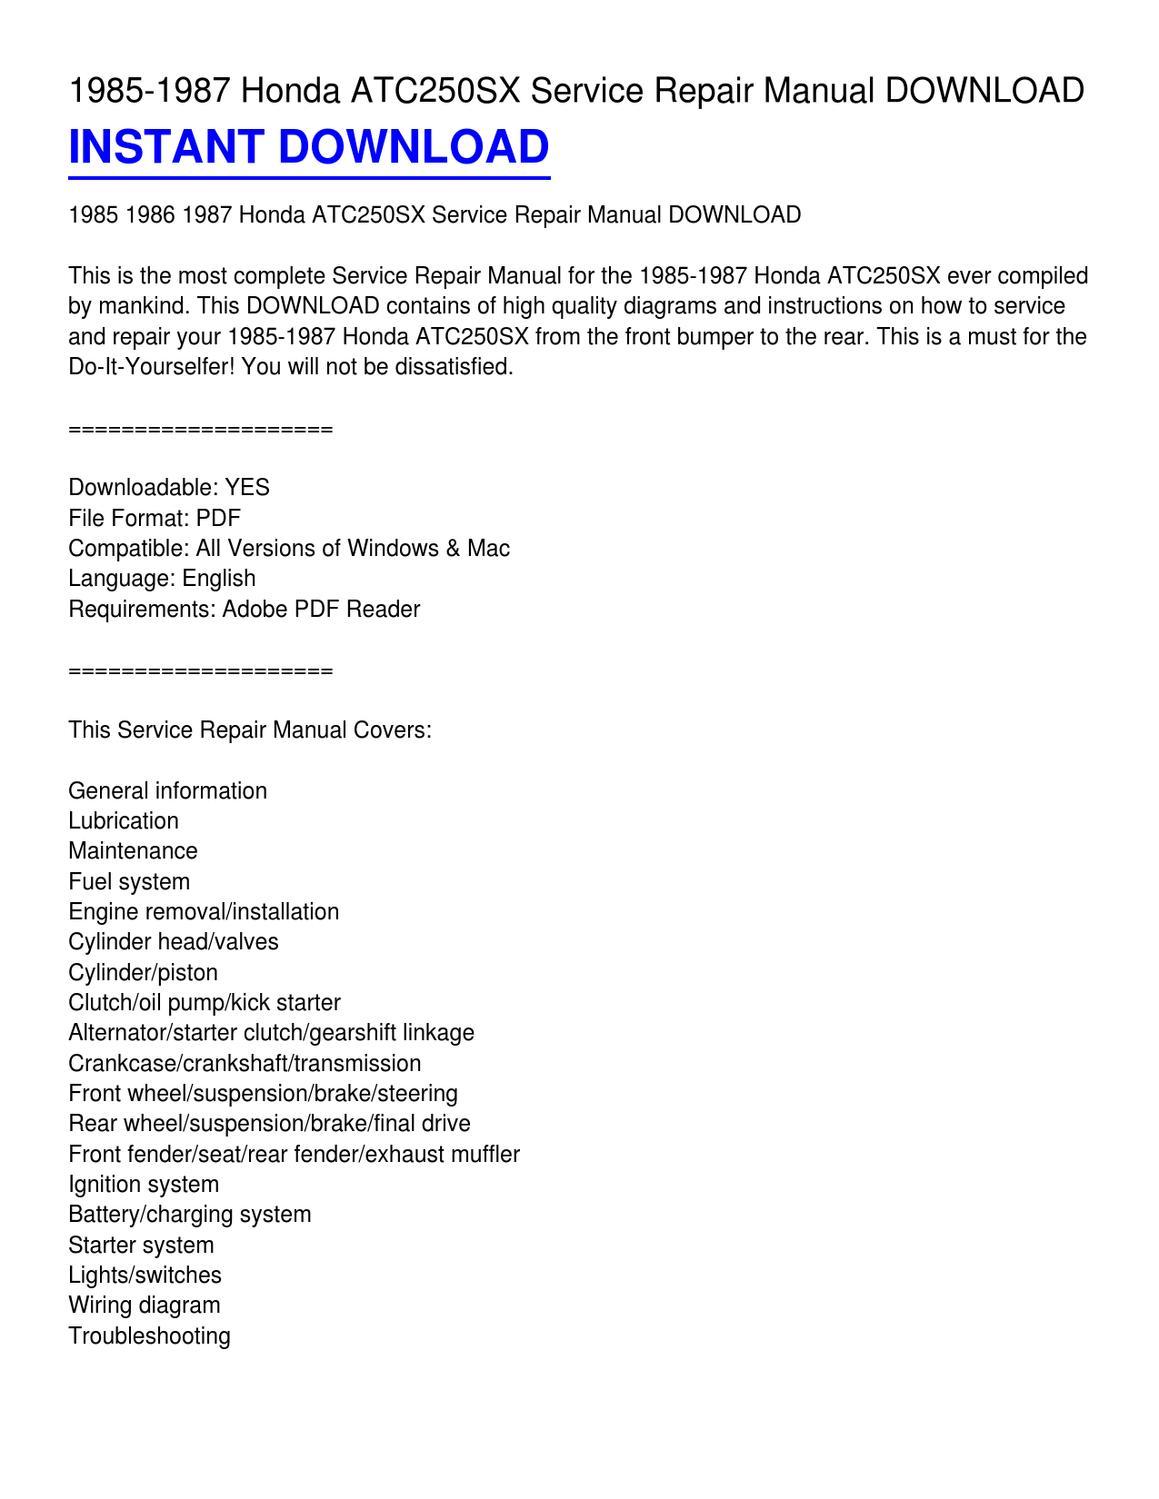 hight resolution of 1985 1987 honda atc250sx service repair manual download by phillip serrano issuu